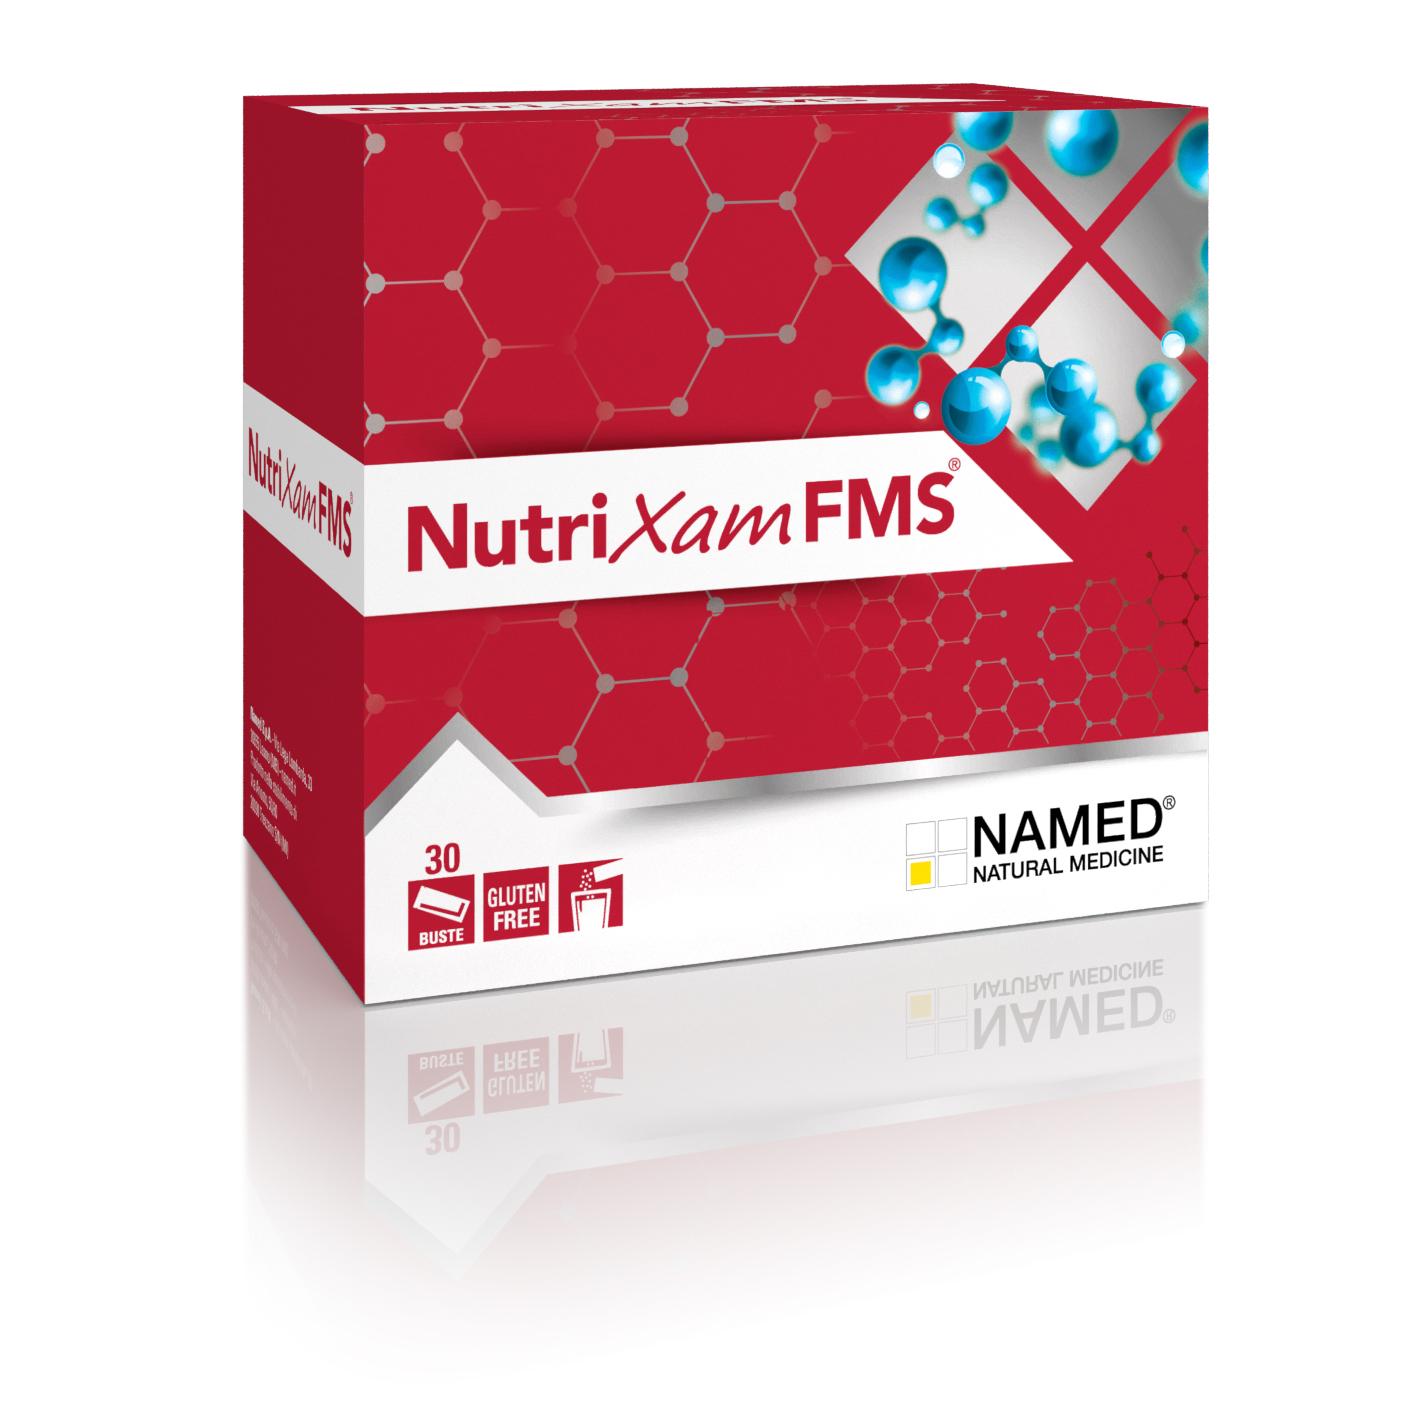 named Nutrixam FMS®